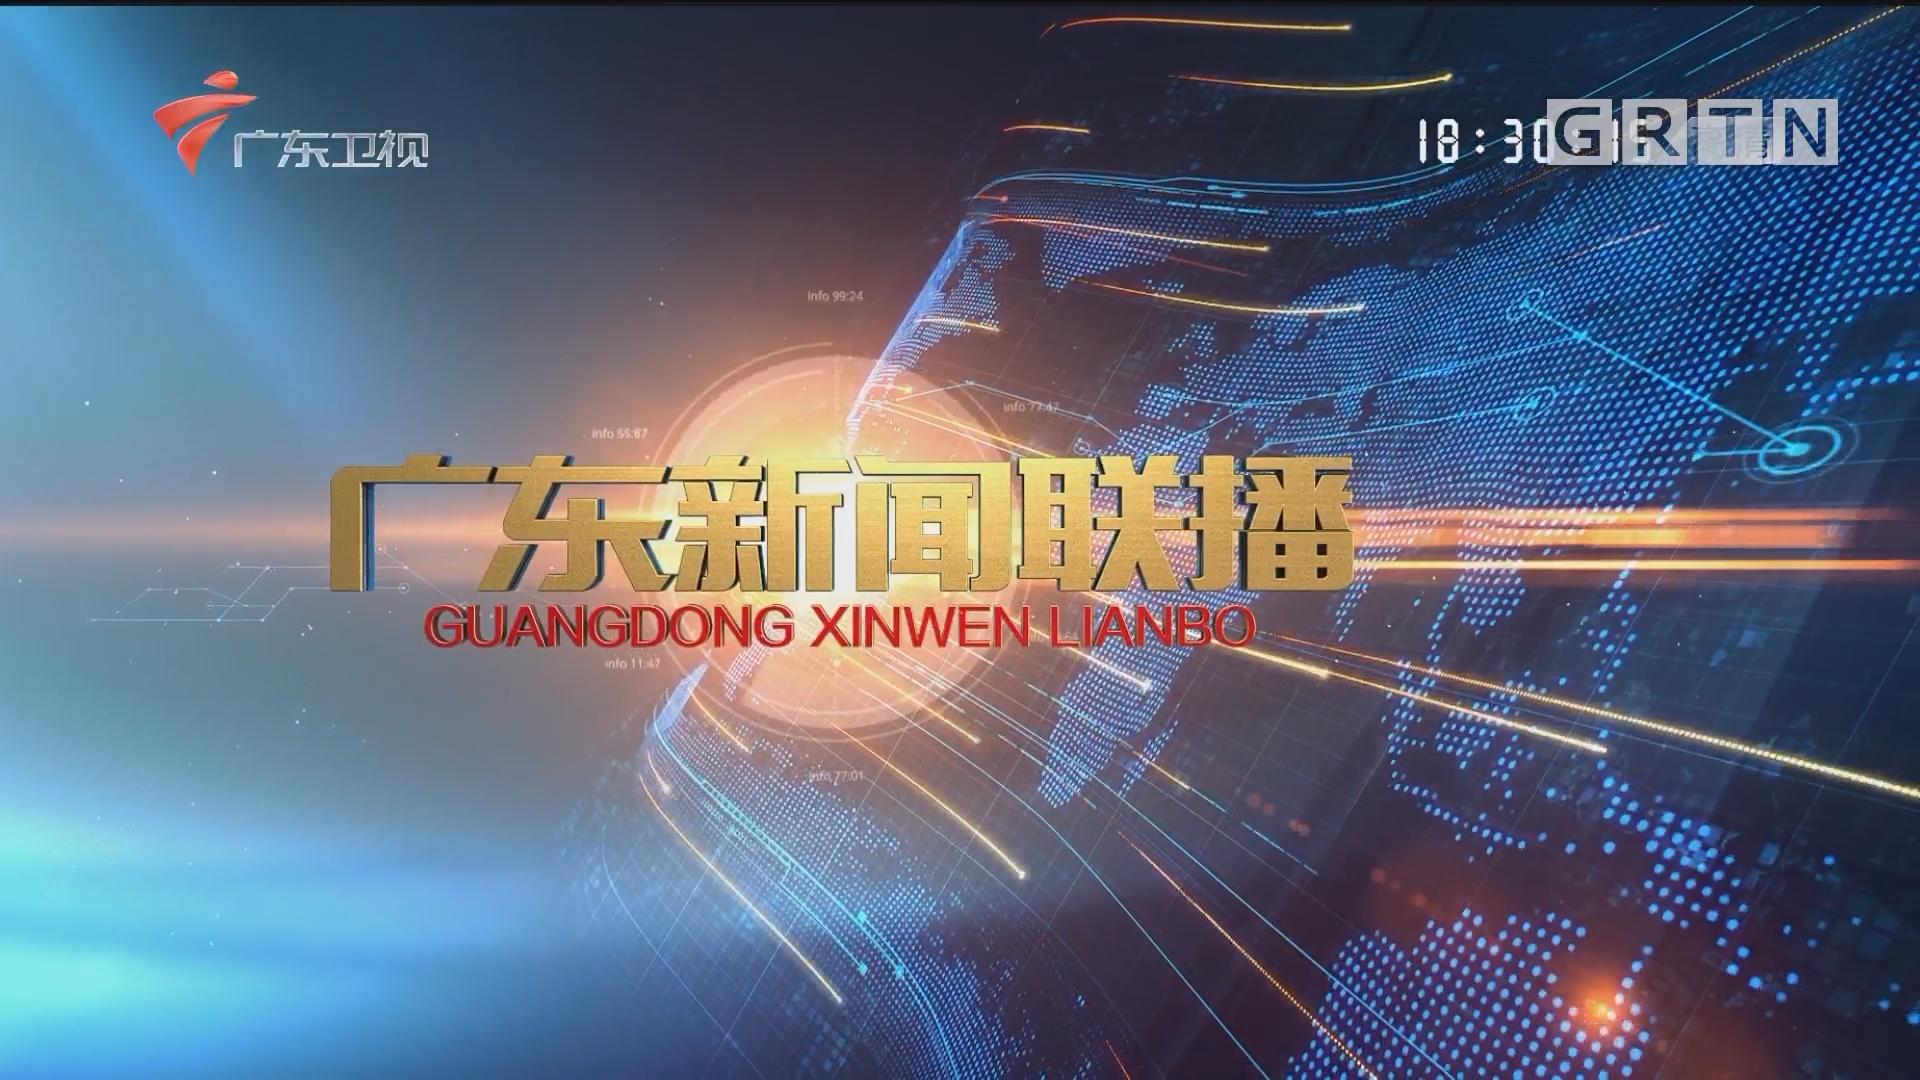 [HD][2017-11-03]广东新闻联播:广东省政府代表团赴黑龙江省开展对口合作交流活动 推动两省高层次全方位多渠道交流合作